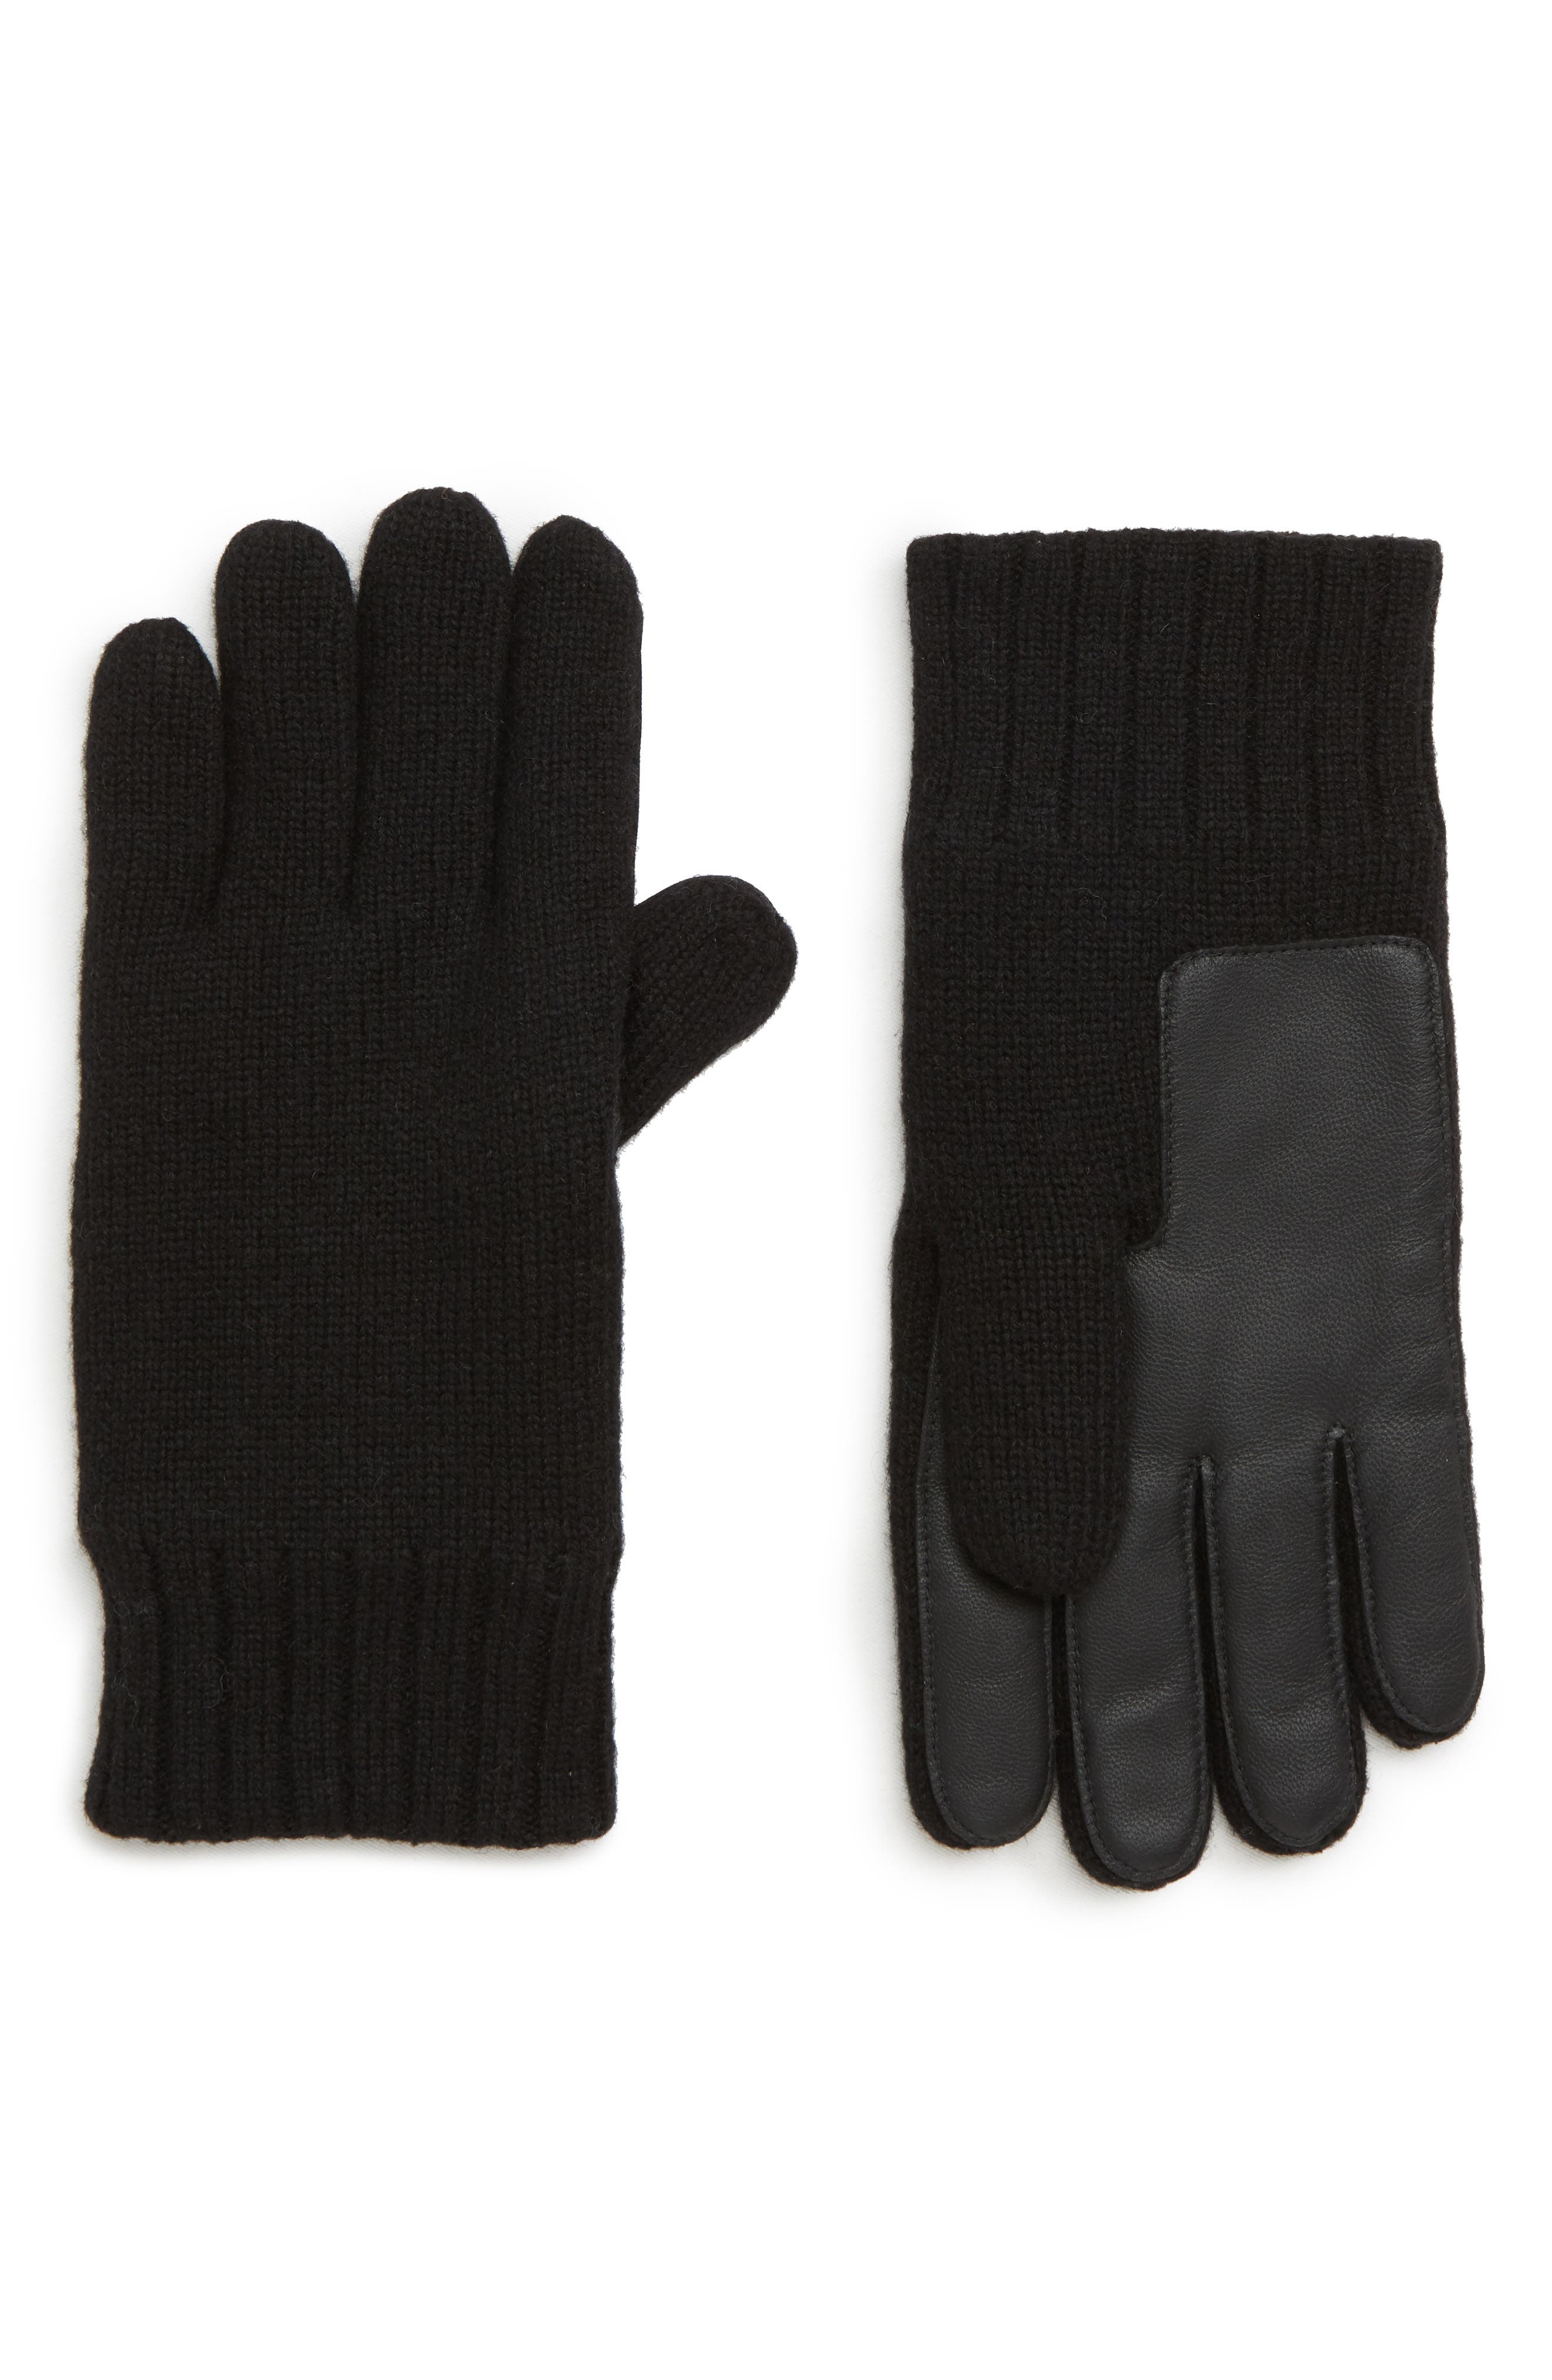 Leather Palm Knit Gloves,                         Main,                         color, BLACK